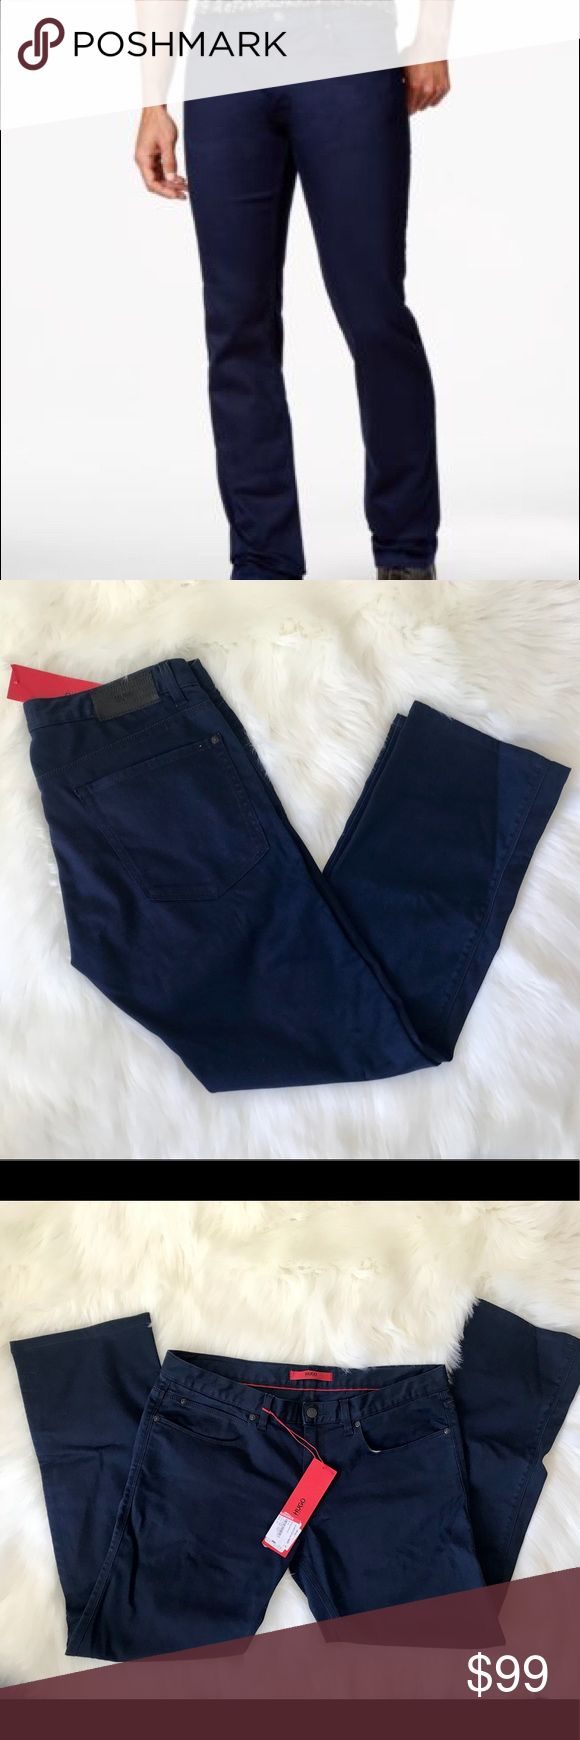 NWT HUGO BOSS 708 Slim Fit Jeans in Blue NWT HUGO (Red Label) by Hugo Boss 708 Slim Fit Jeans in Blue; Size 34X34; •Slim fit •Five-pocket styling •Zip fly •98% Cotton 2% Elastane Hugo Boss Jeans Slim Straight